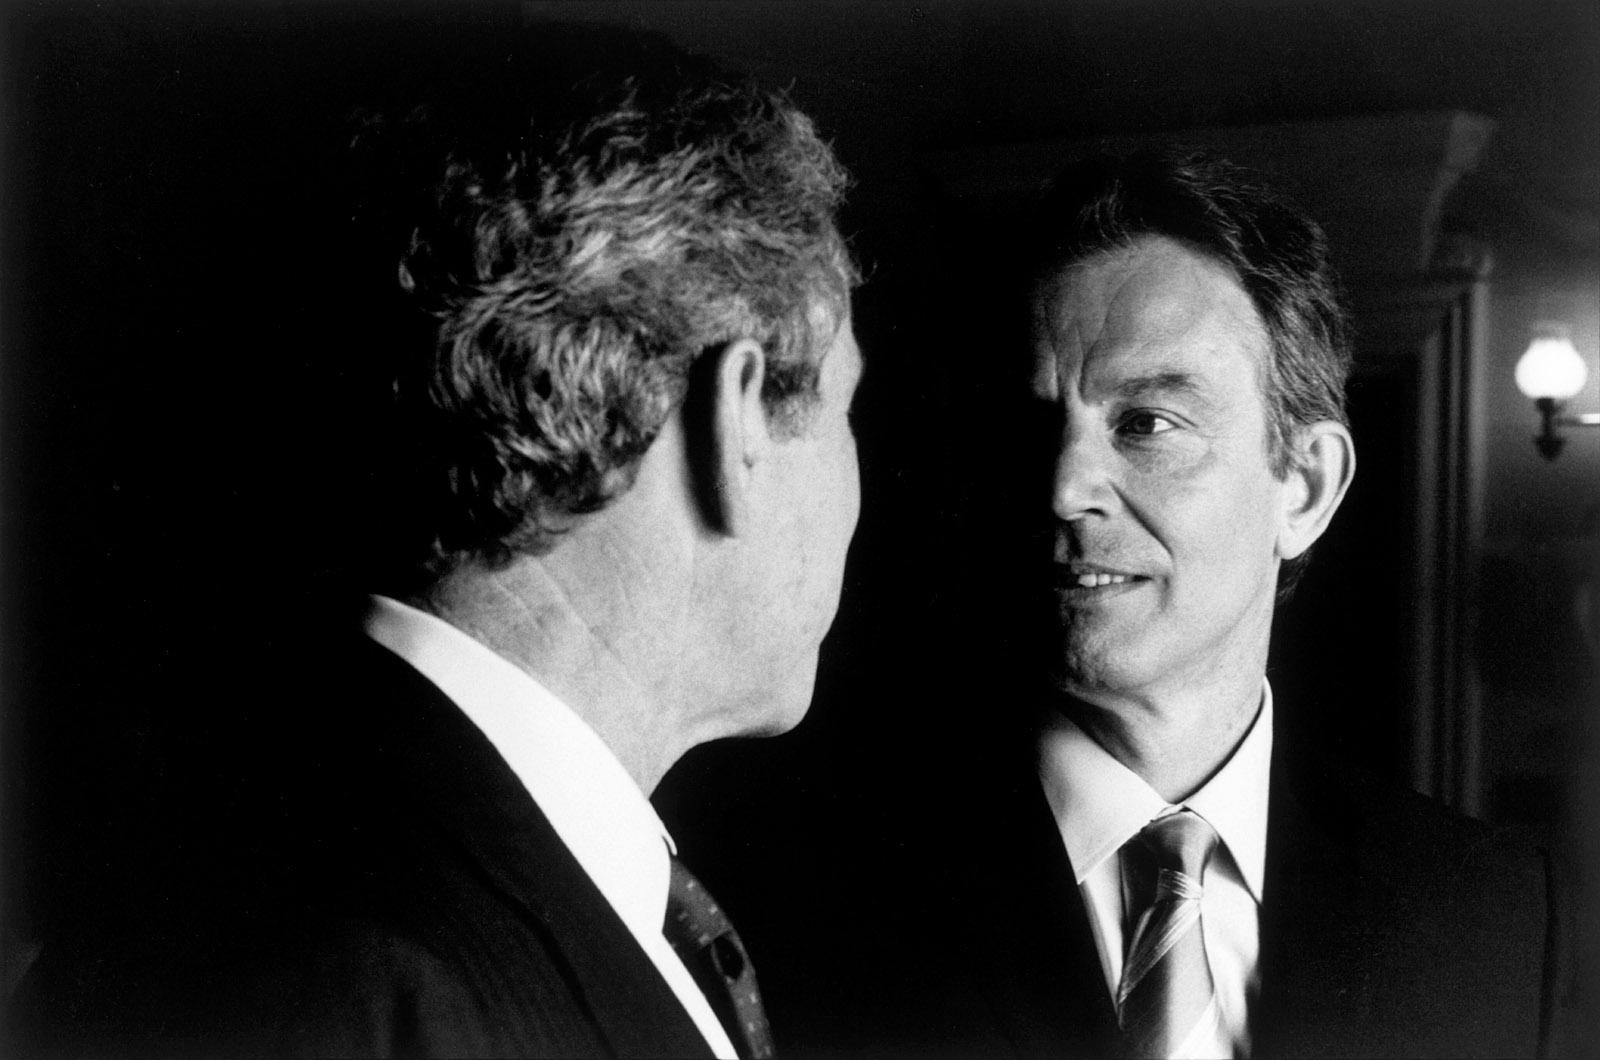 George W. Bush and Tony Blair at Hillborough Castle, near Belfast, Northern Ireland, April 2003